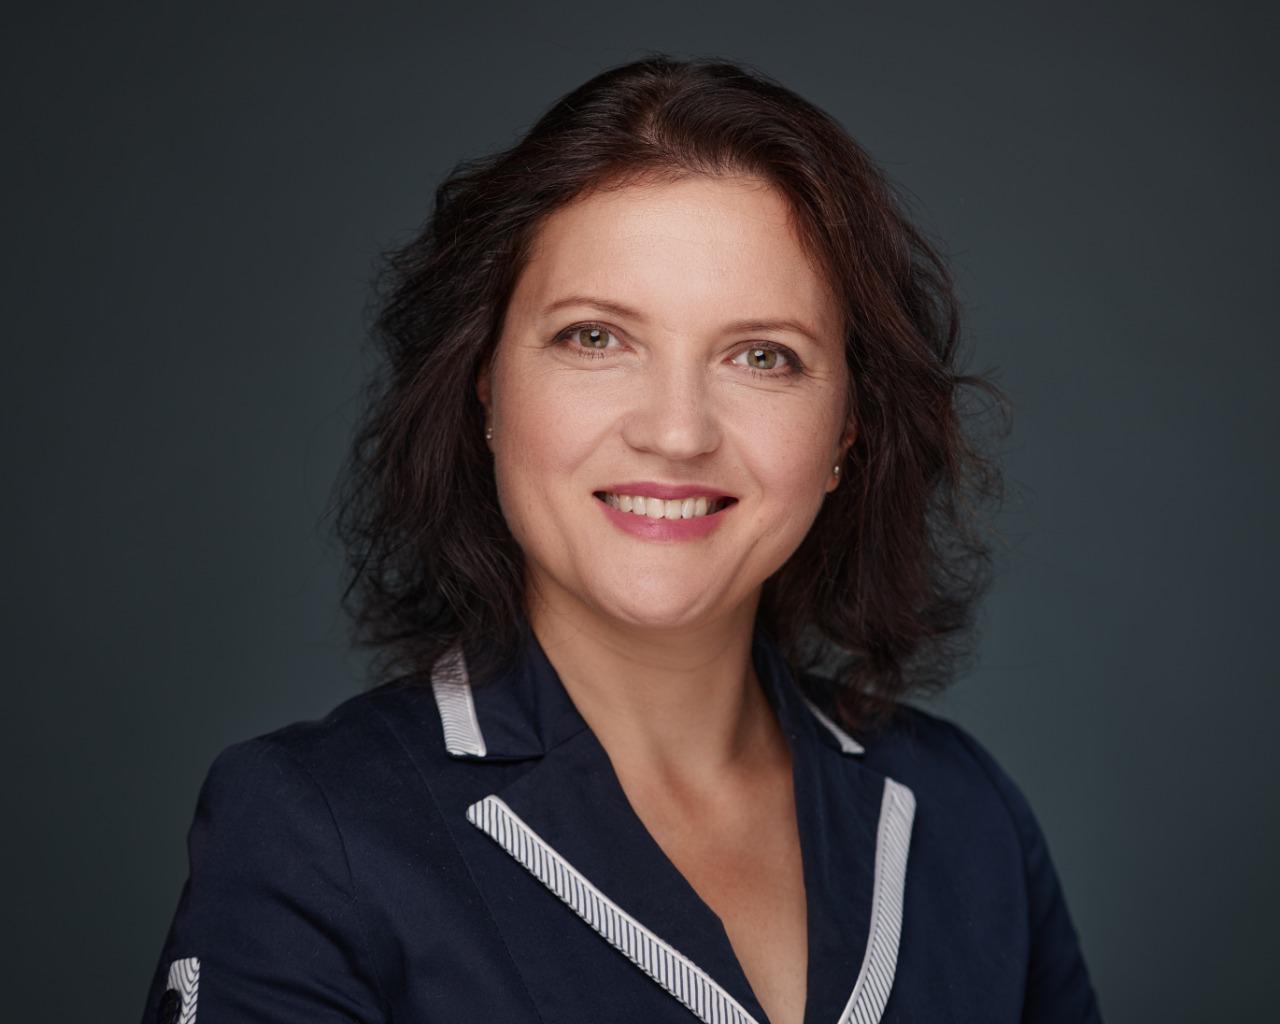 Мария Филинкова